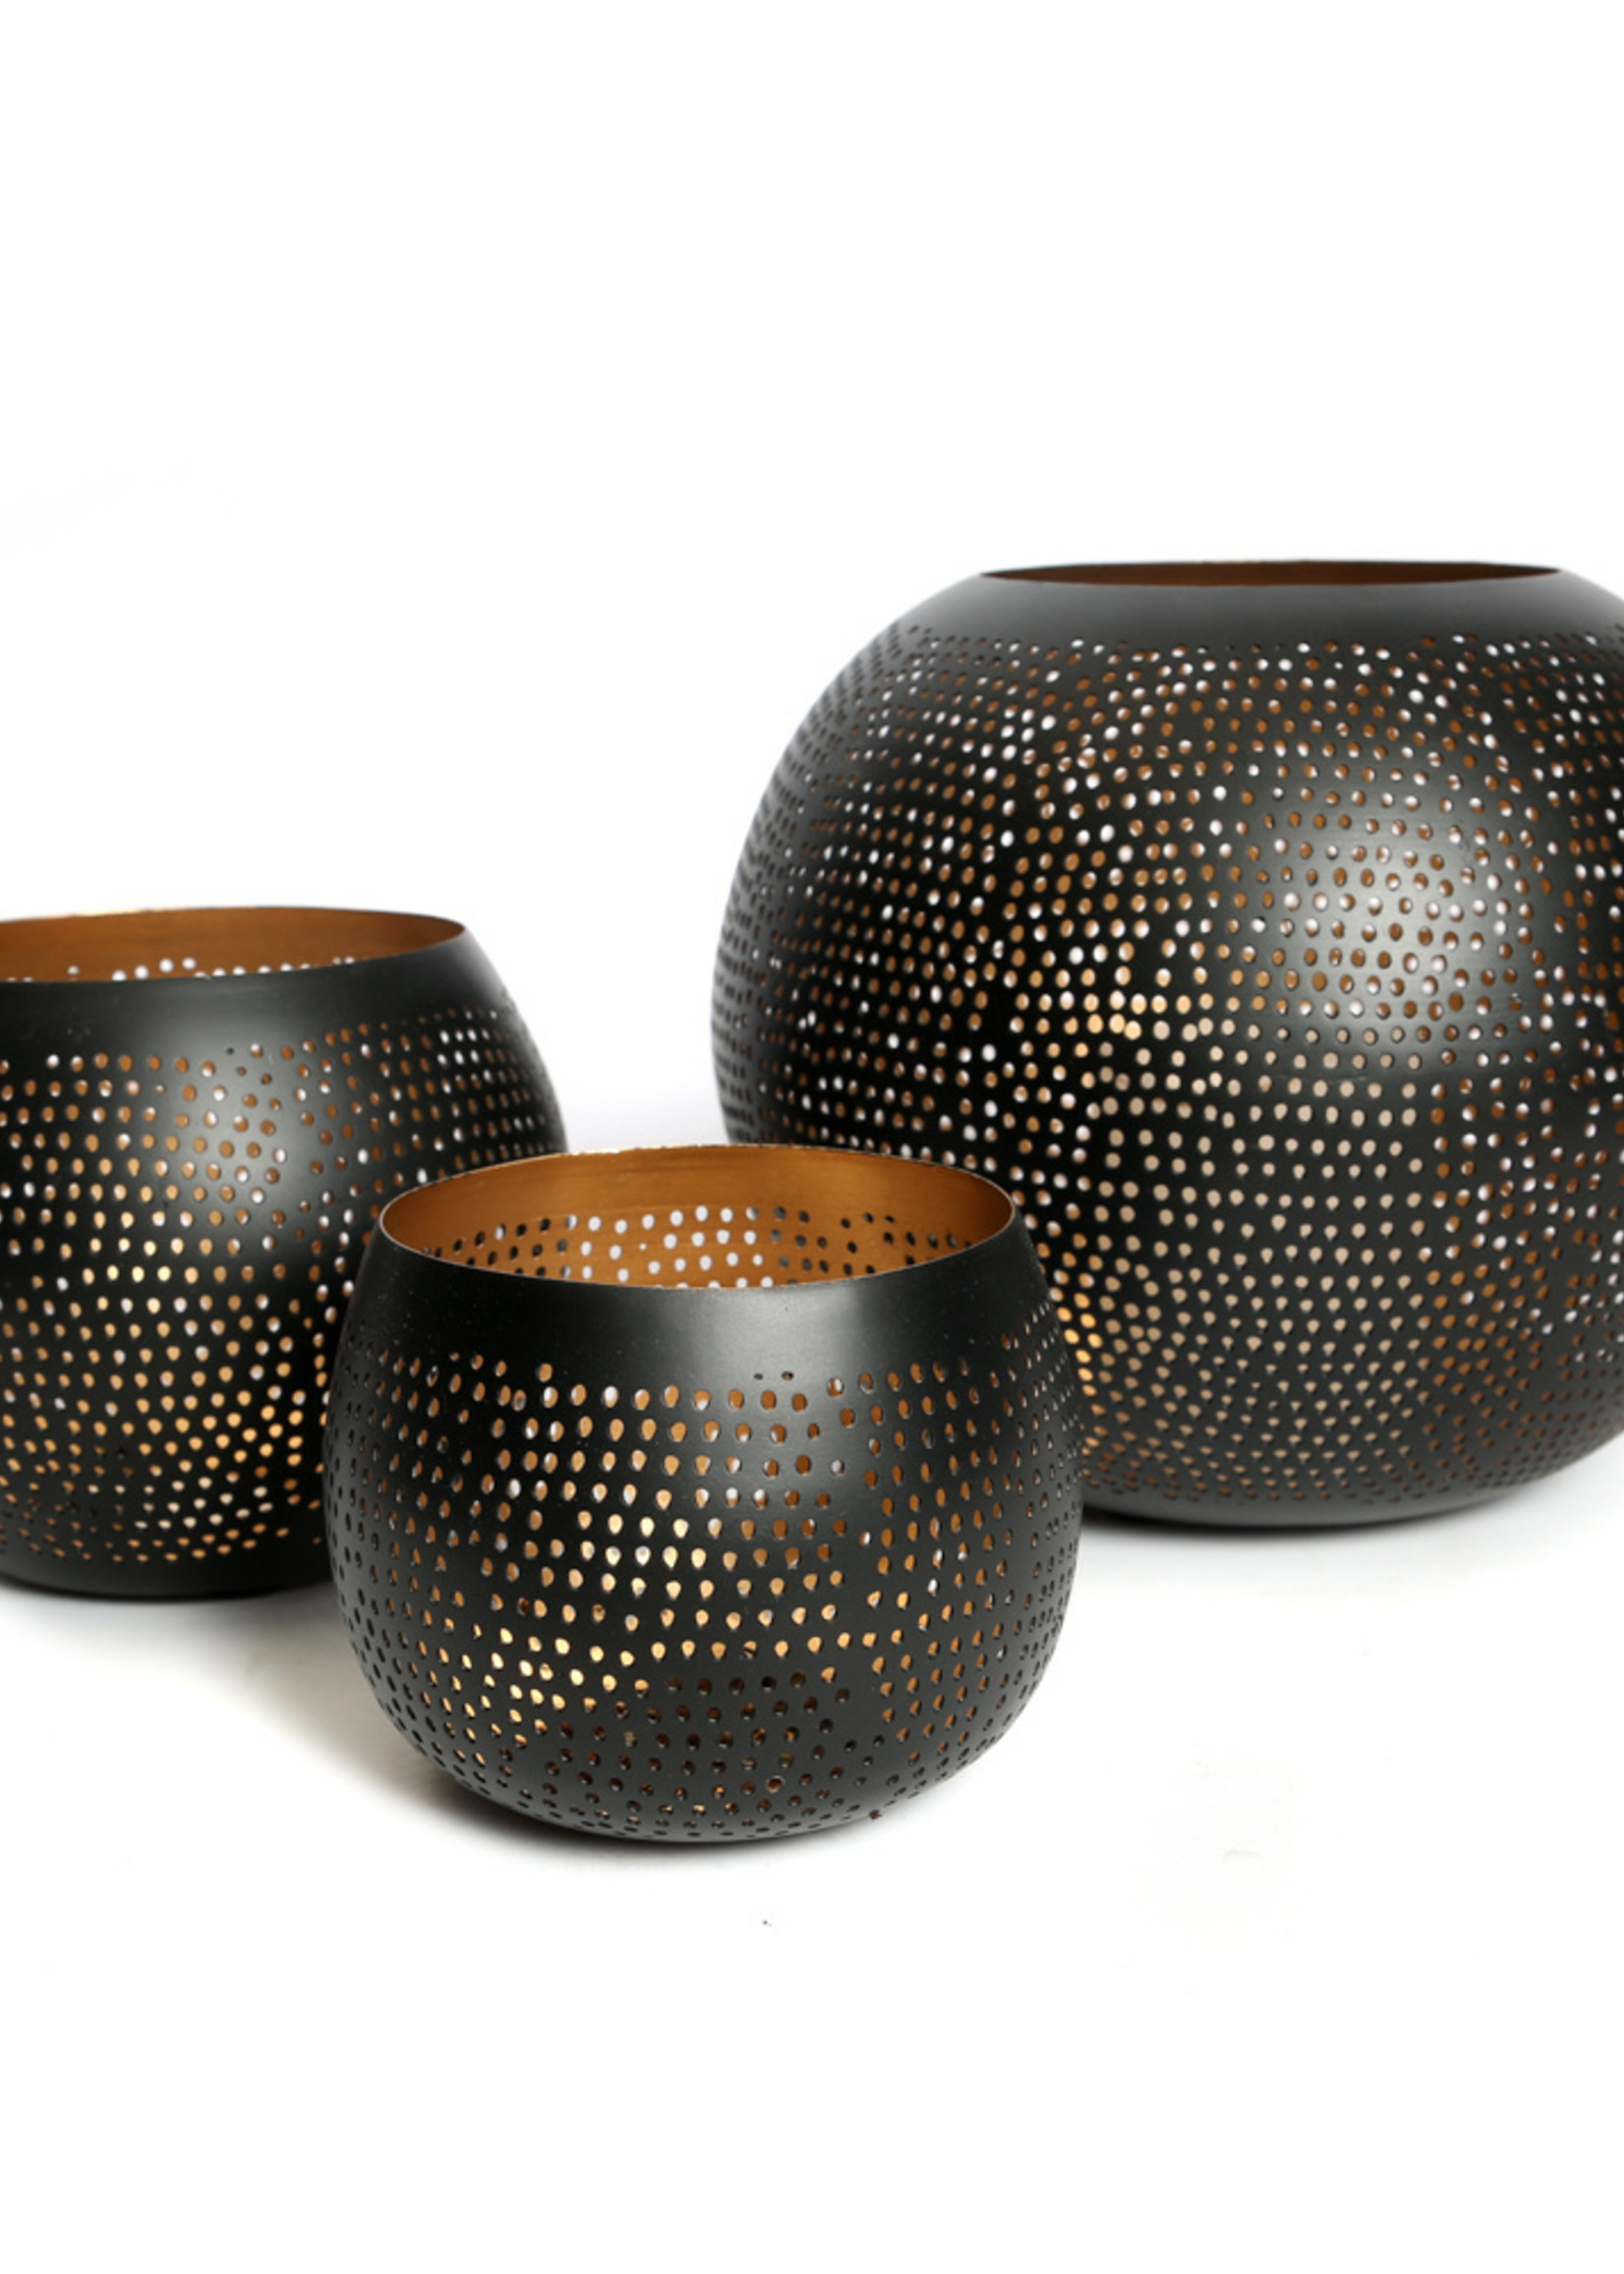 The Pierced Ball - Black Gold - S